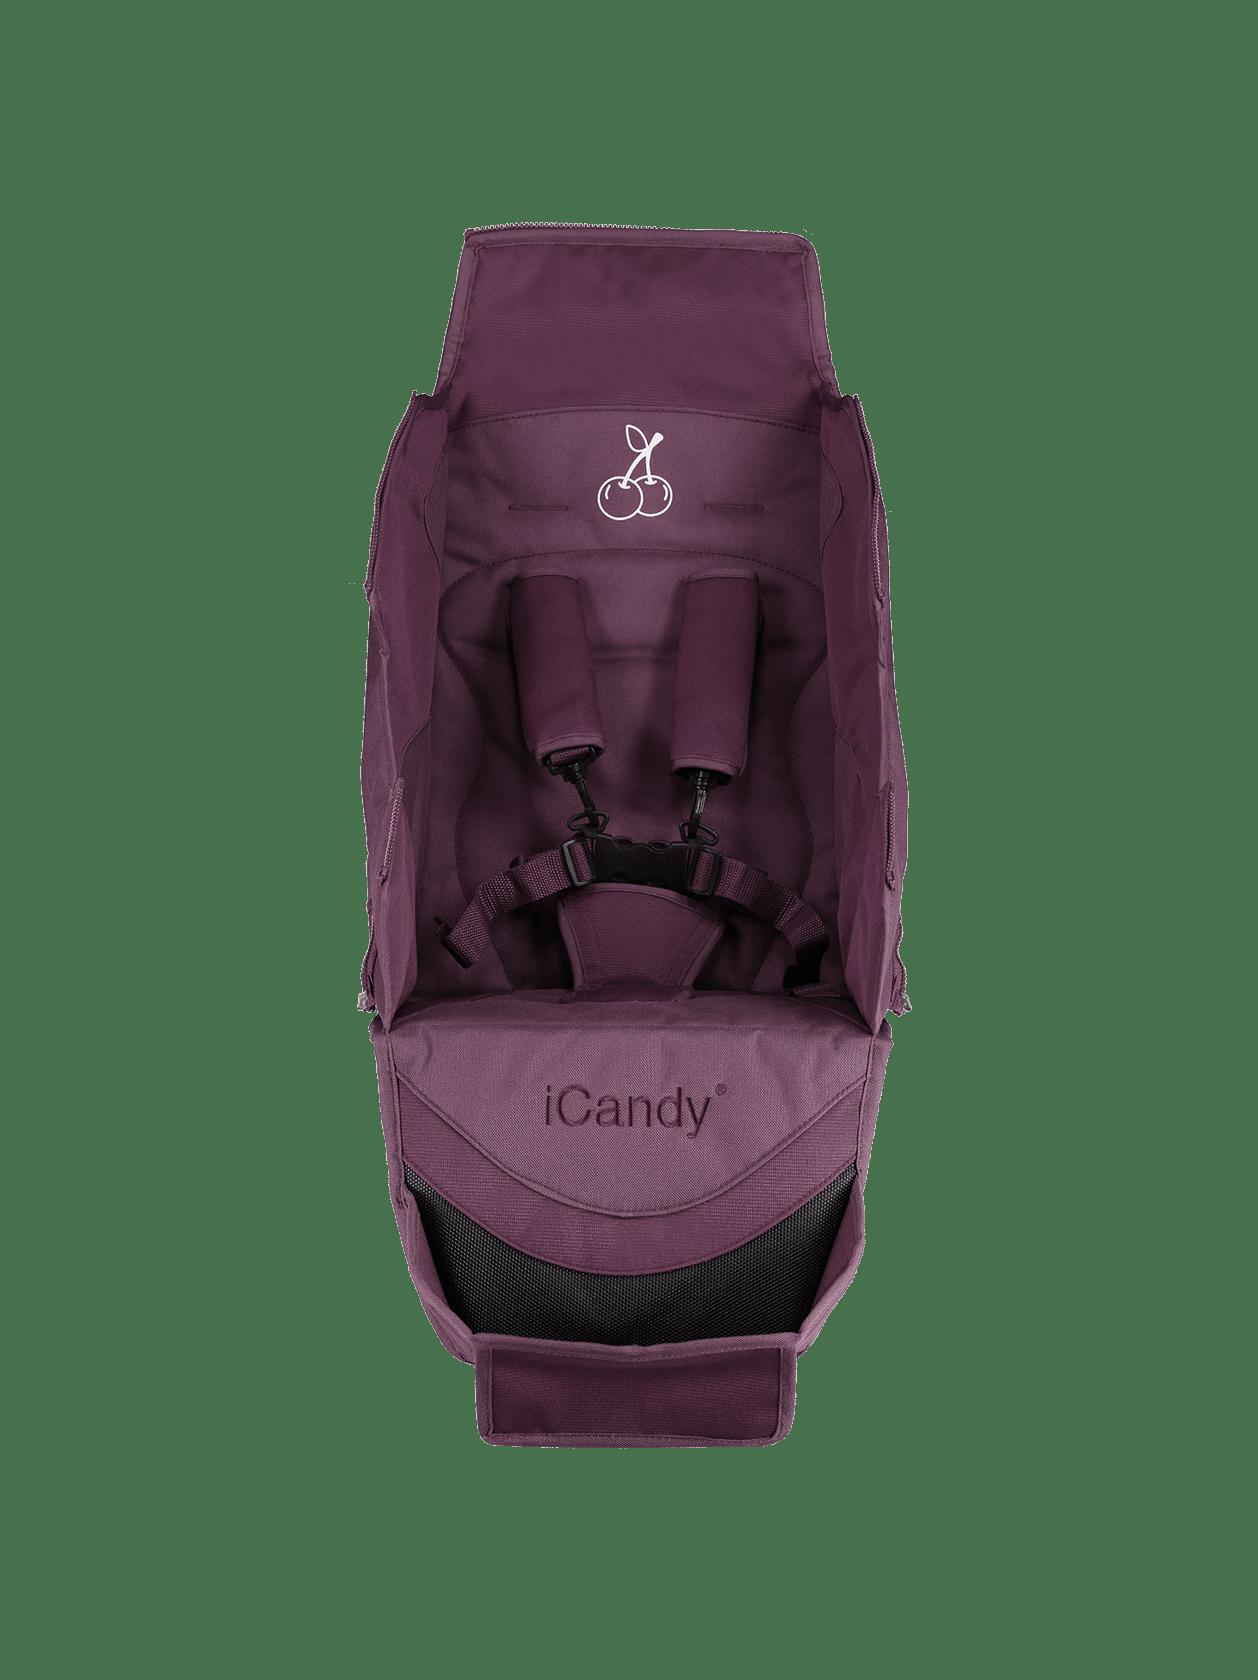 Cherry Seat Unit Fabric Mulberry